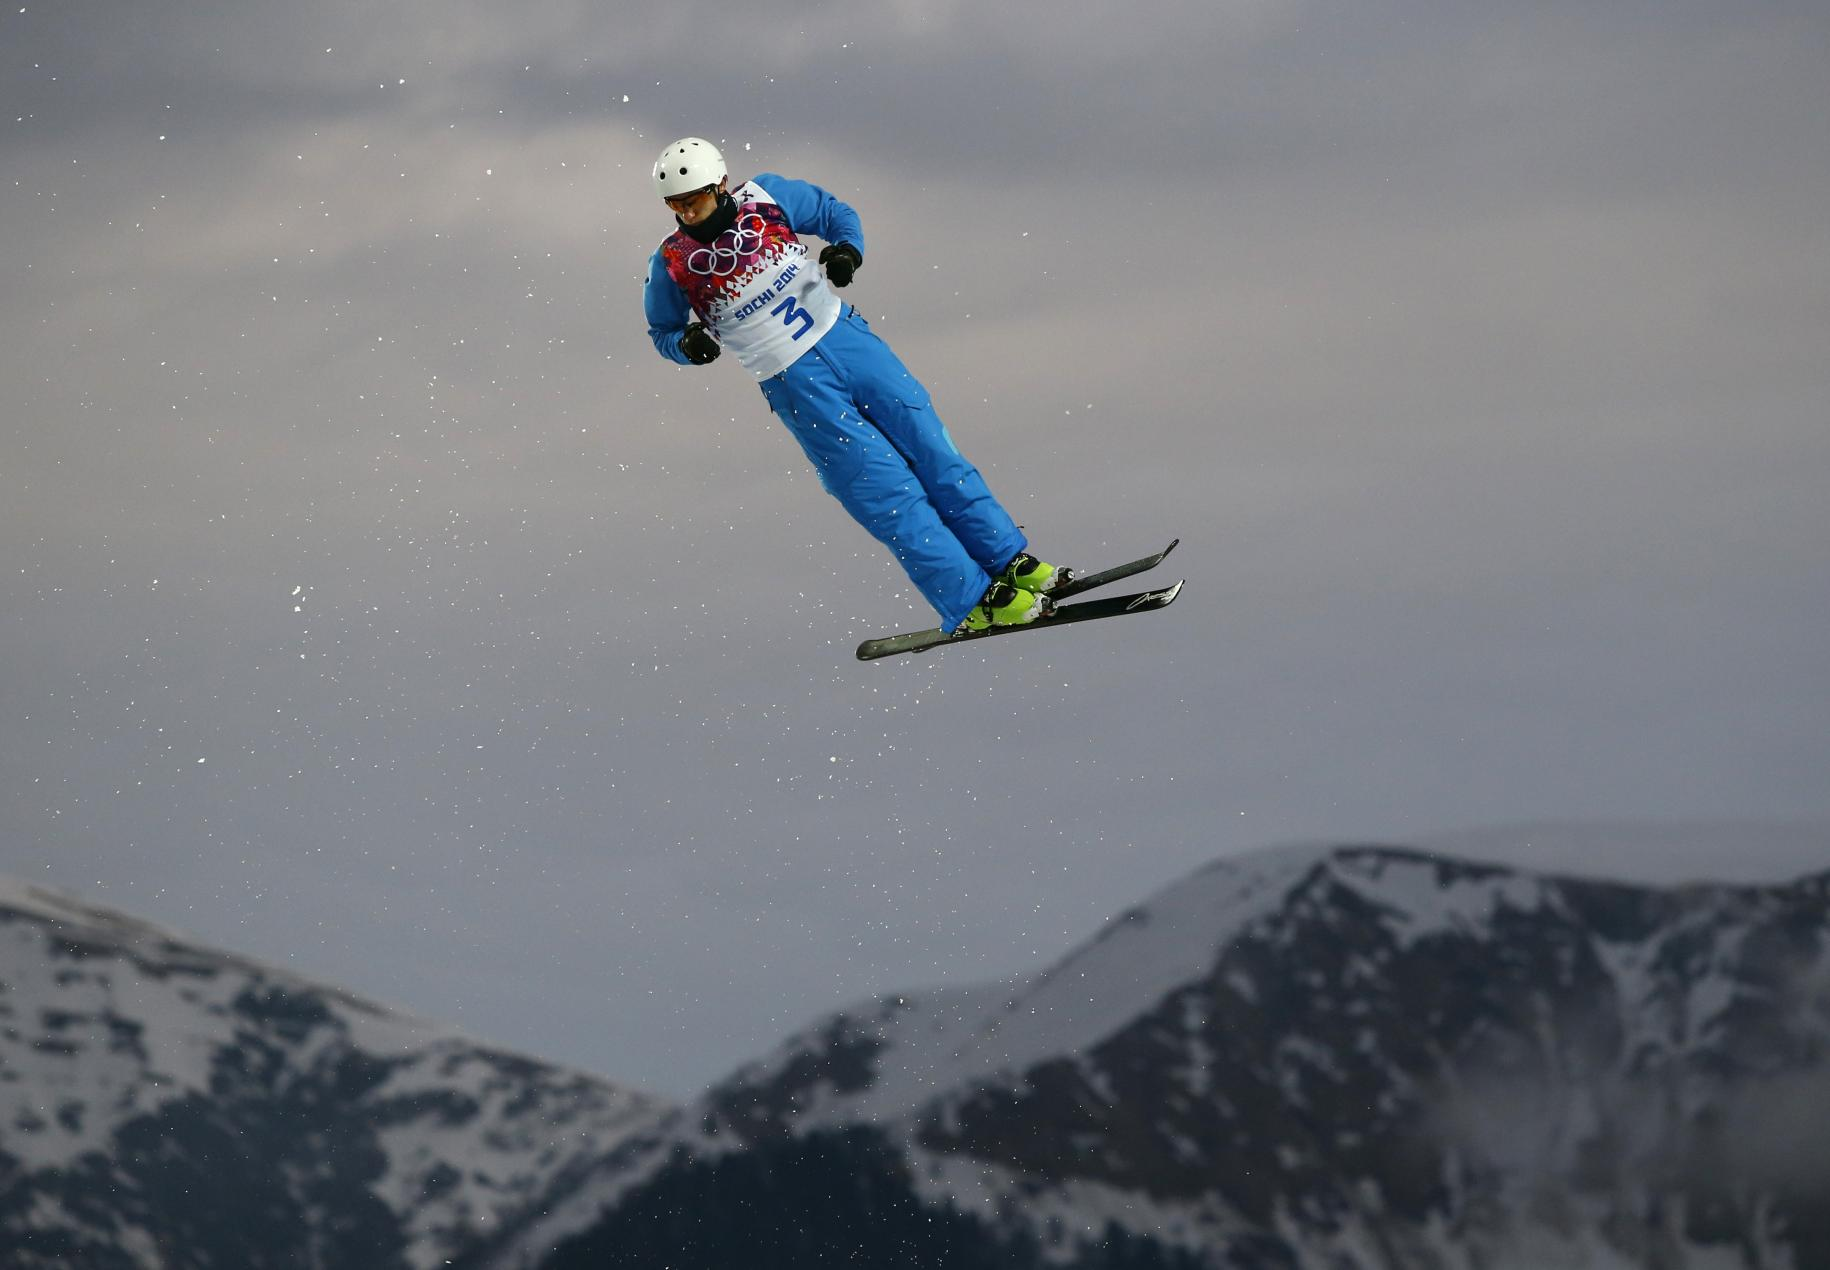 Sochi_Olympics_Freest_ONe.jpg